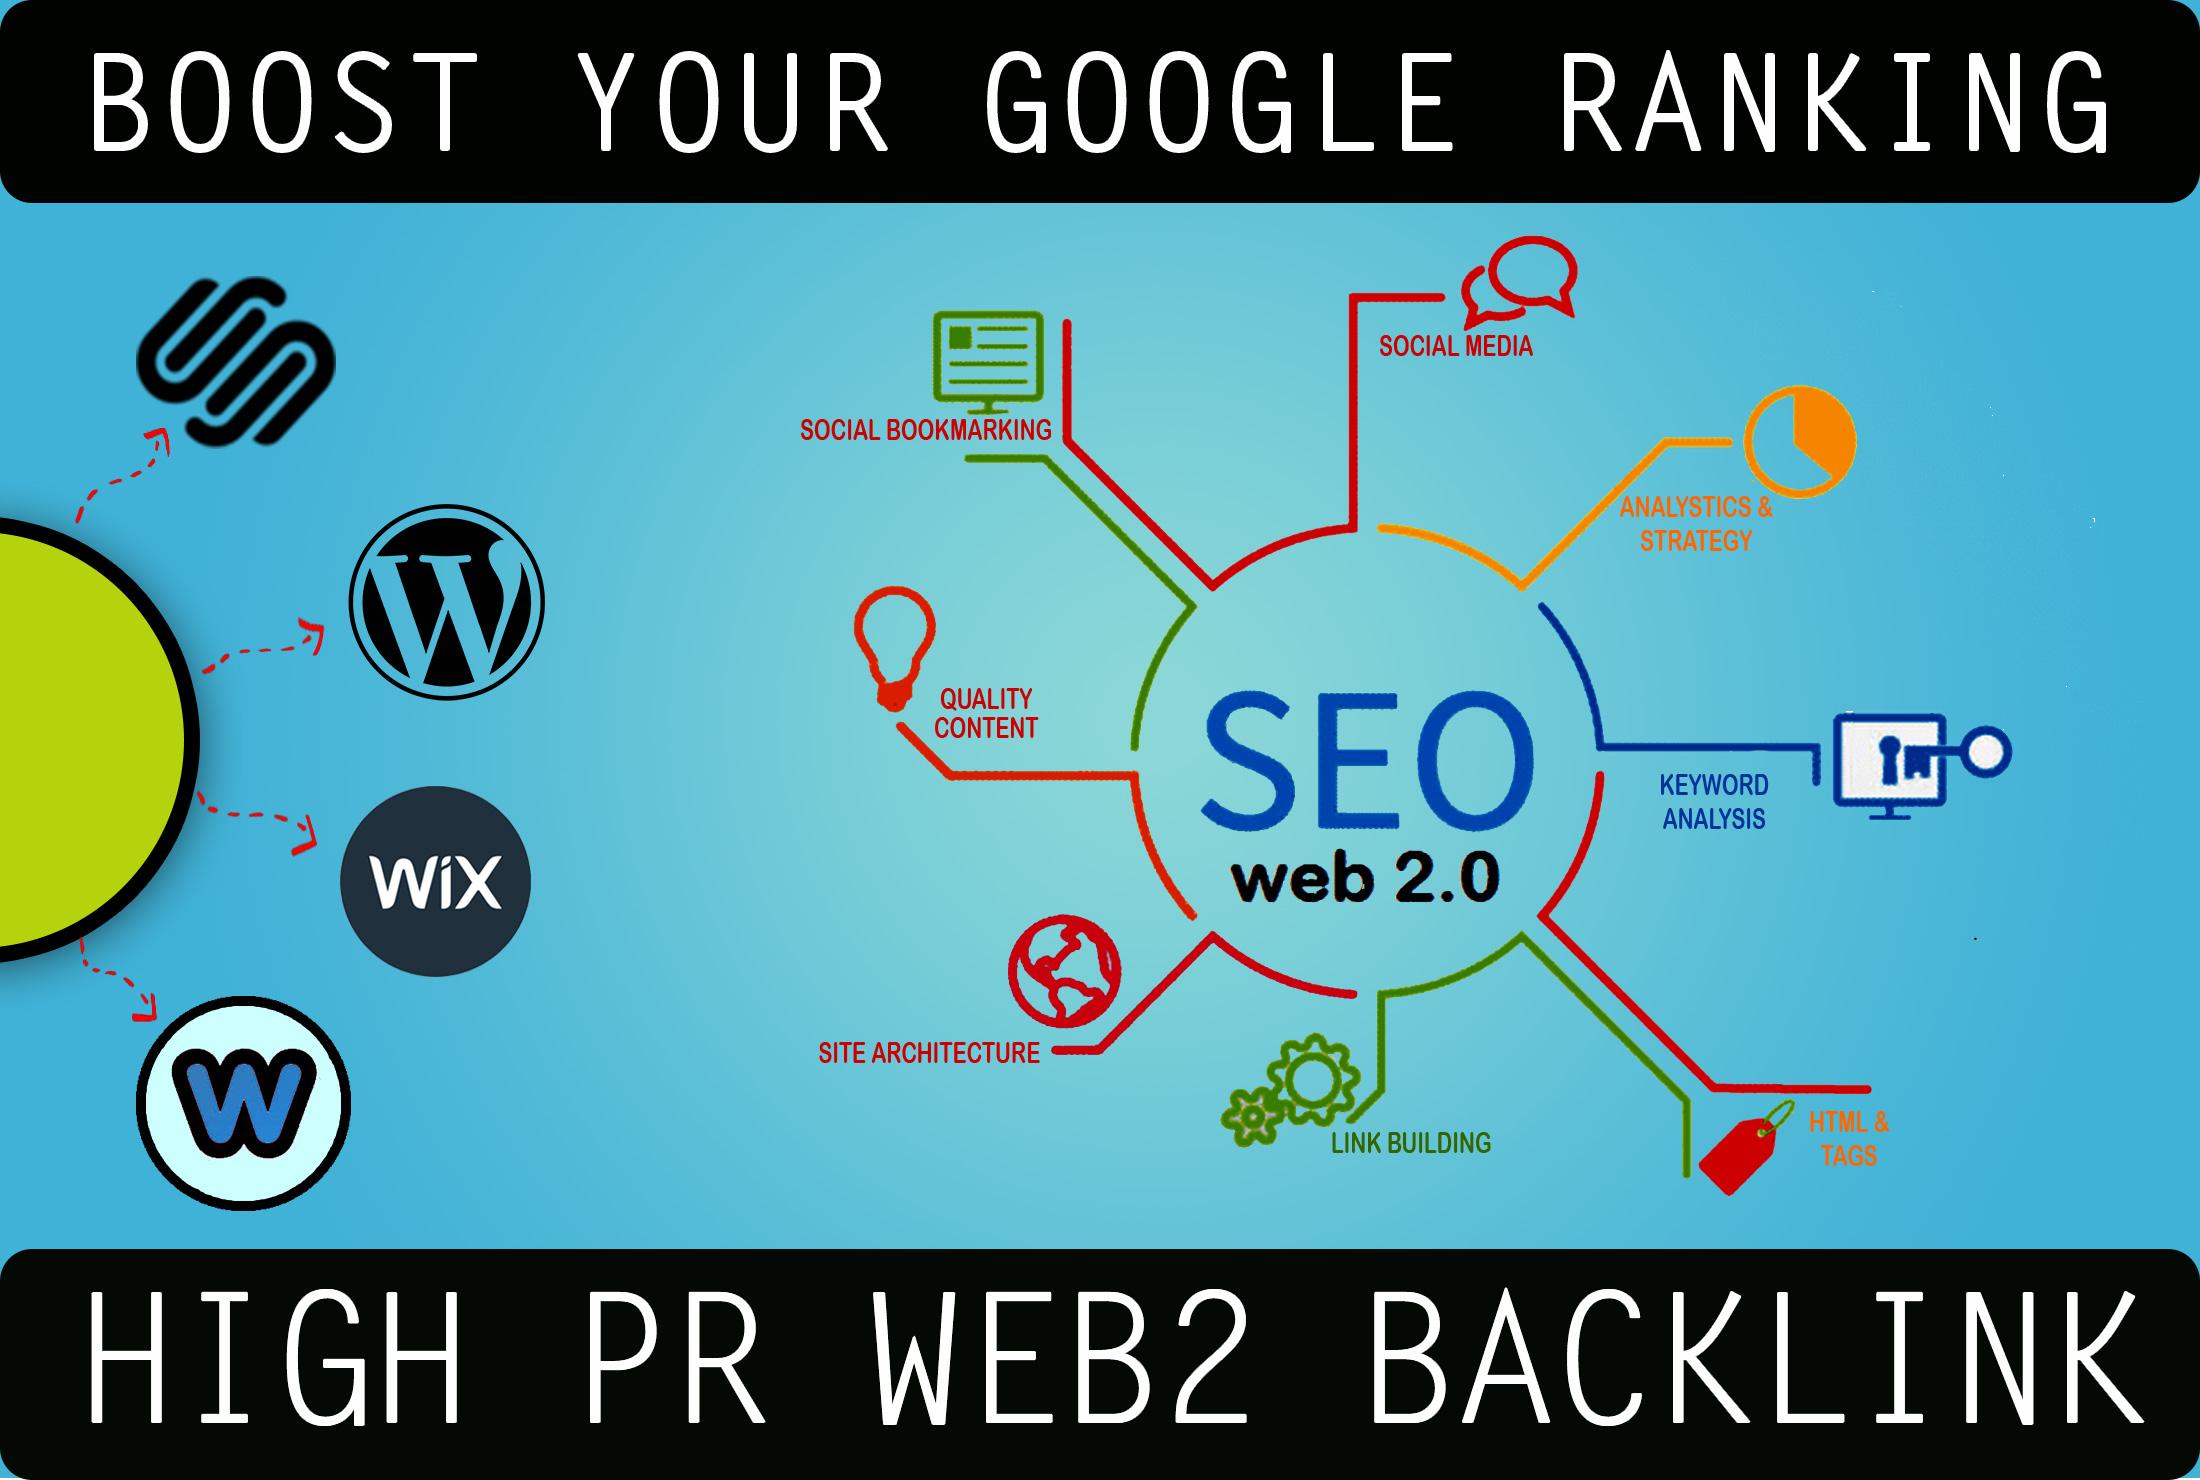 30+ high PR lifetime web2.0 backlinks